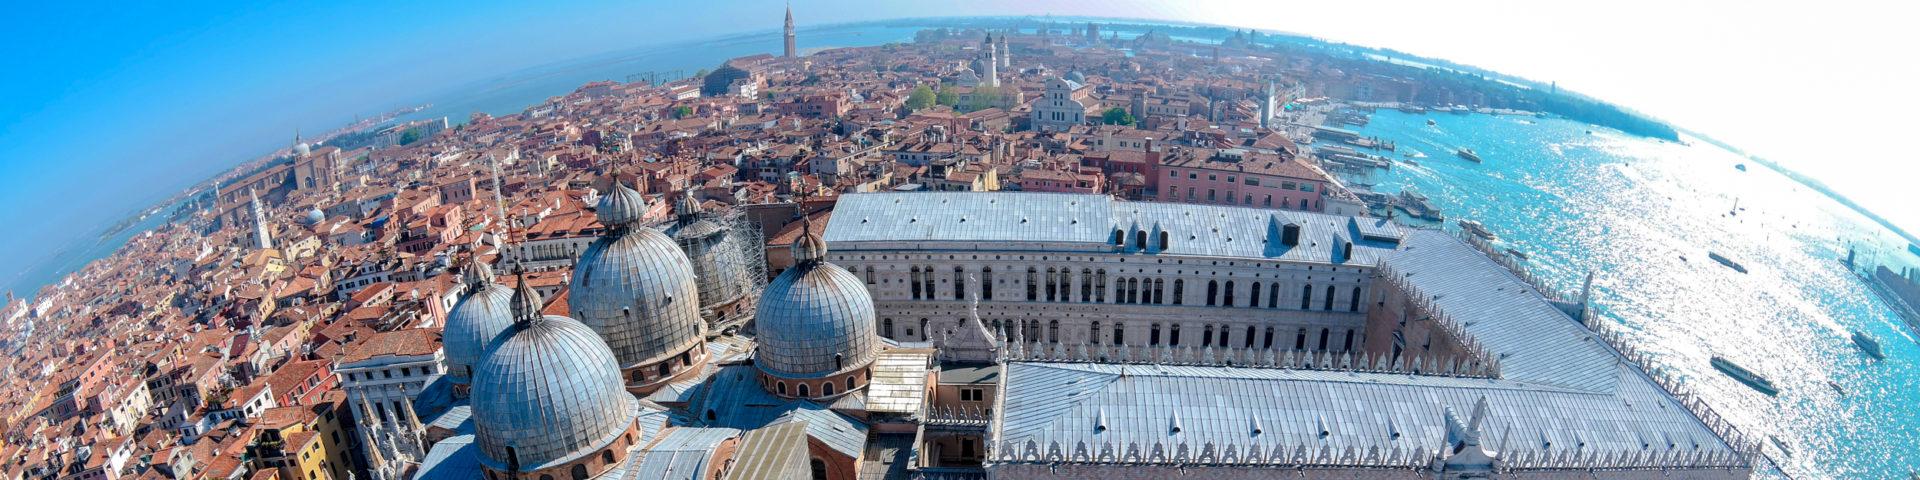 Venedig Venice Dogenpalast